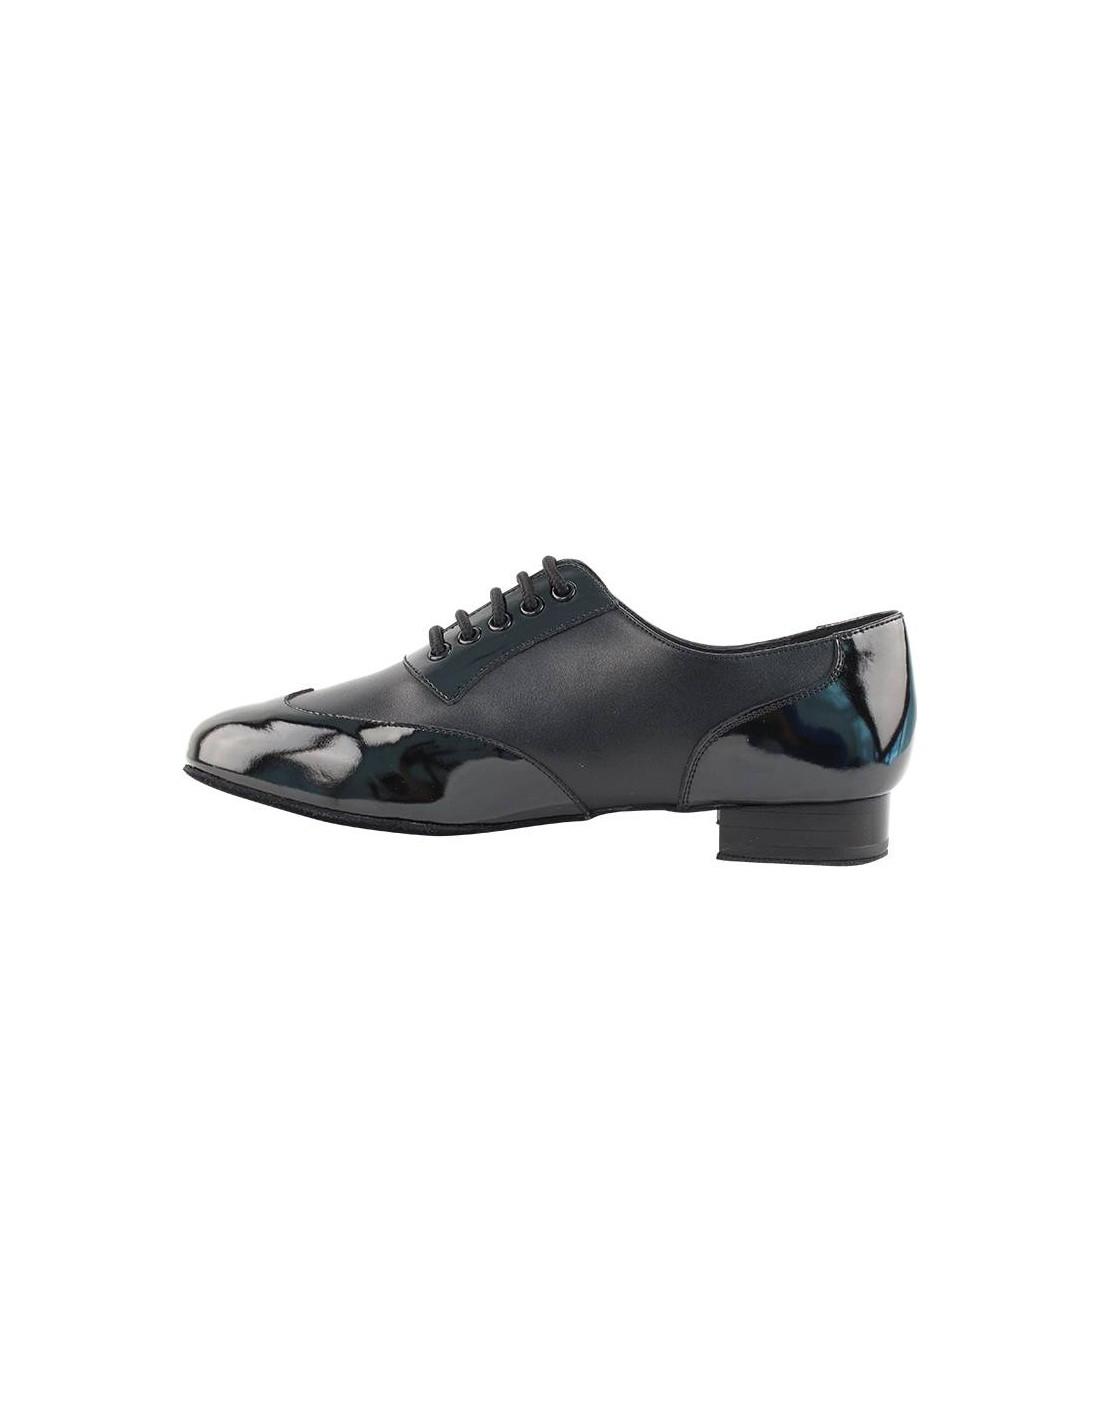 Lati Dance Shoes Pdf